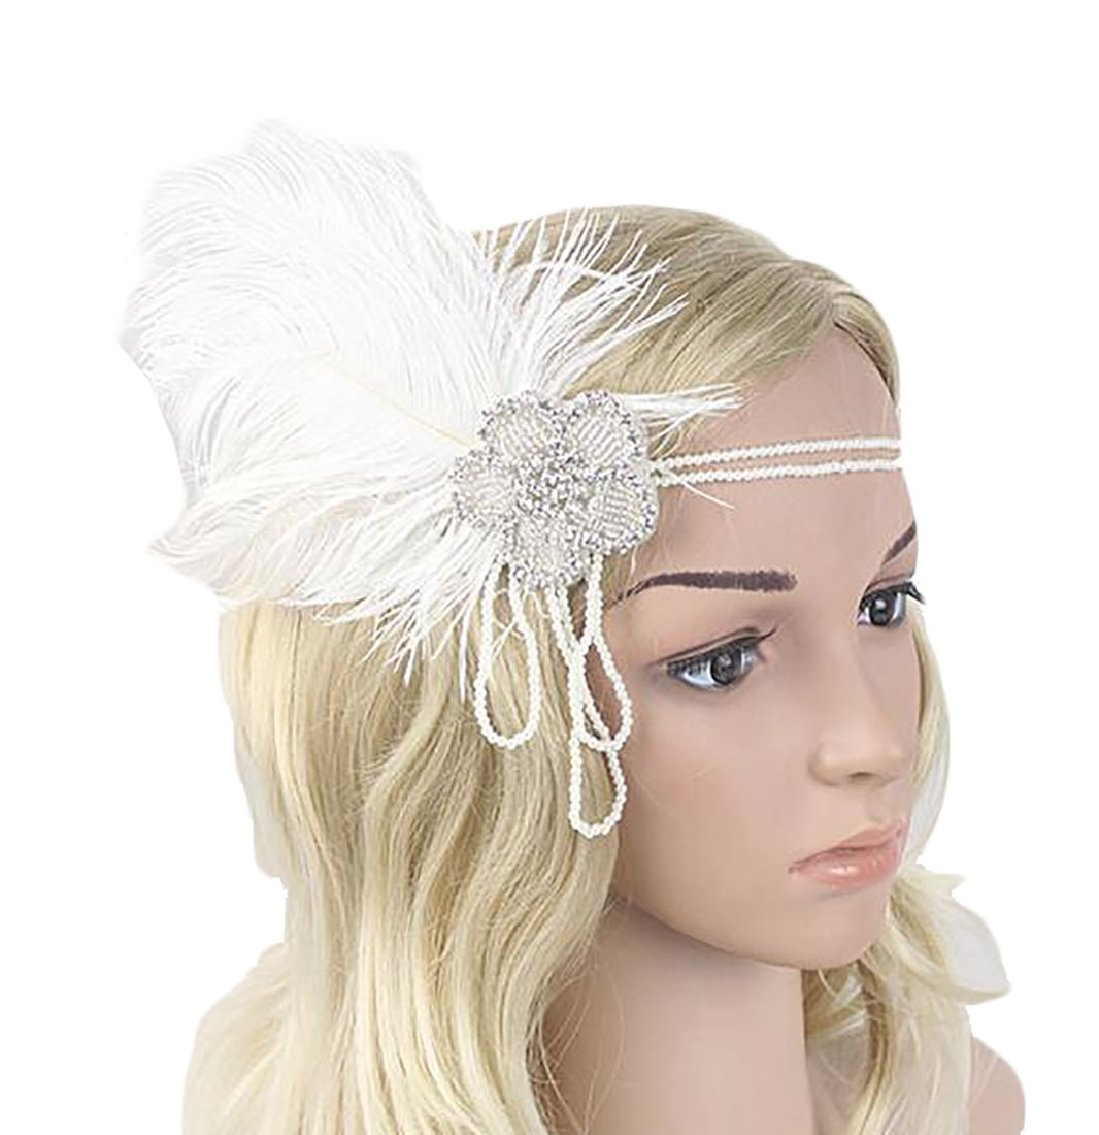 Qiangjinjiu Womens 1920s Flapper Beaded Stylish Headband 20s Feather Headpiece White OS